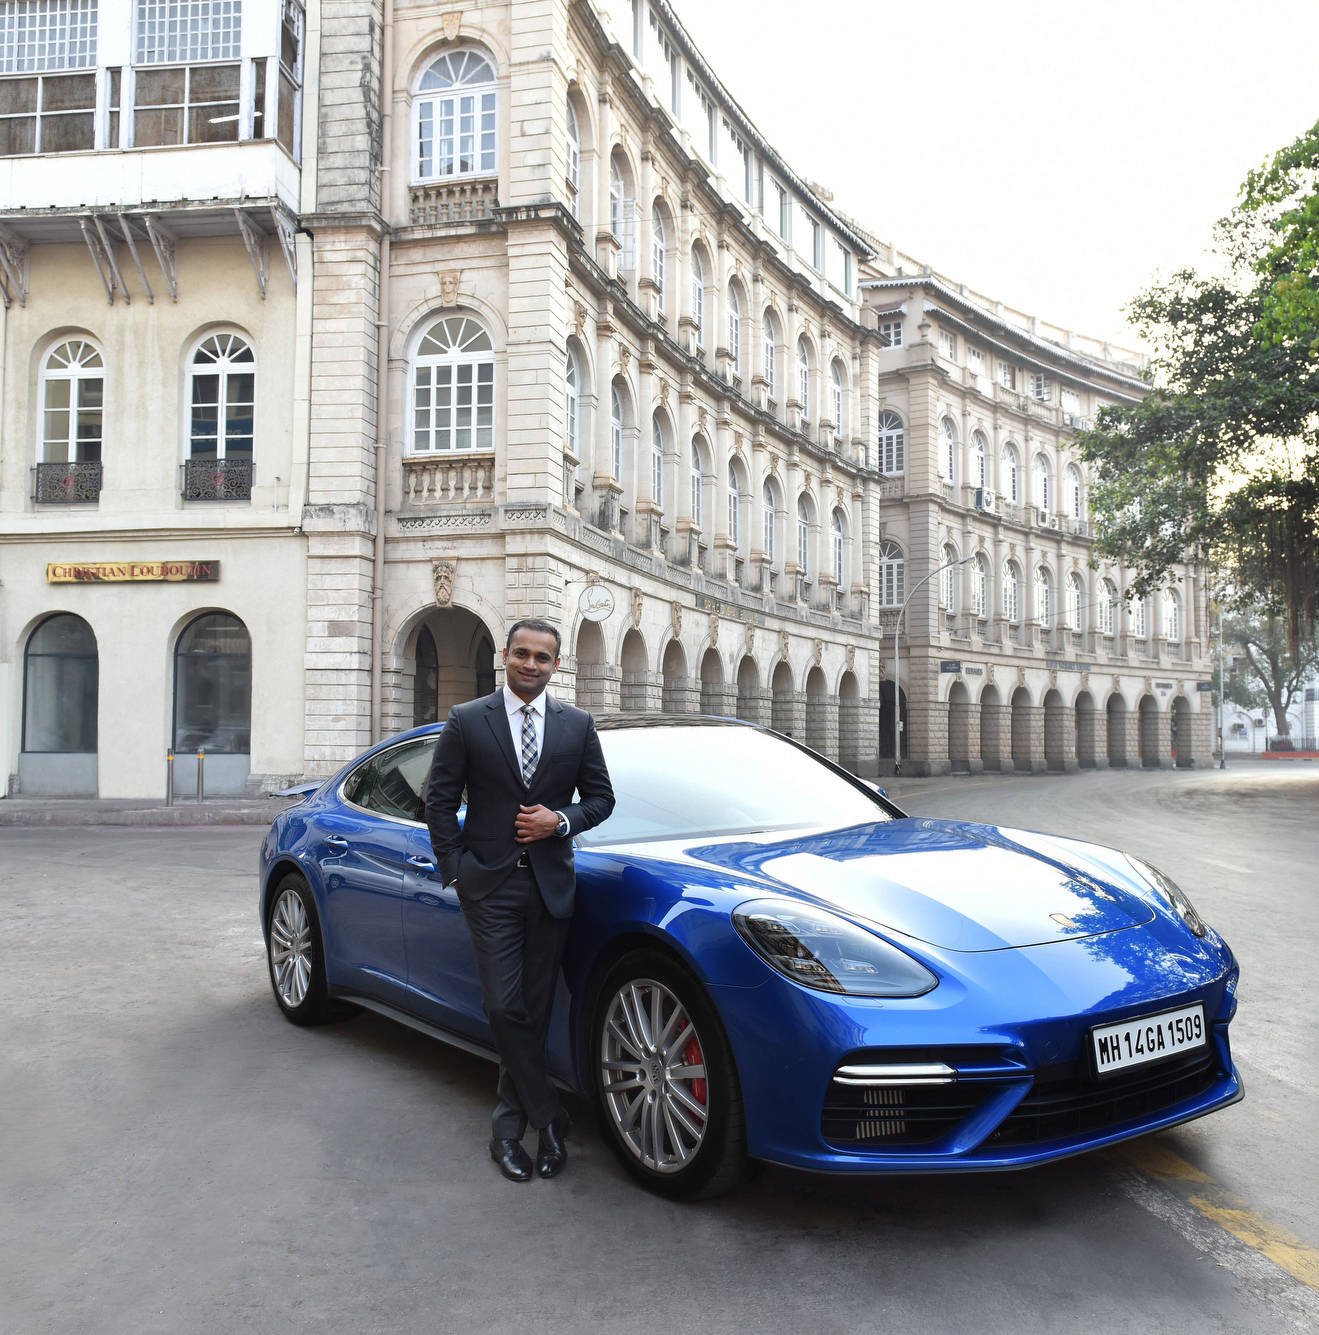 Porsche Panamera Porsche Panamera Launched In India At Rs 1 93 Crore Ex Maharashra Auto News Et Auto